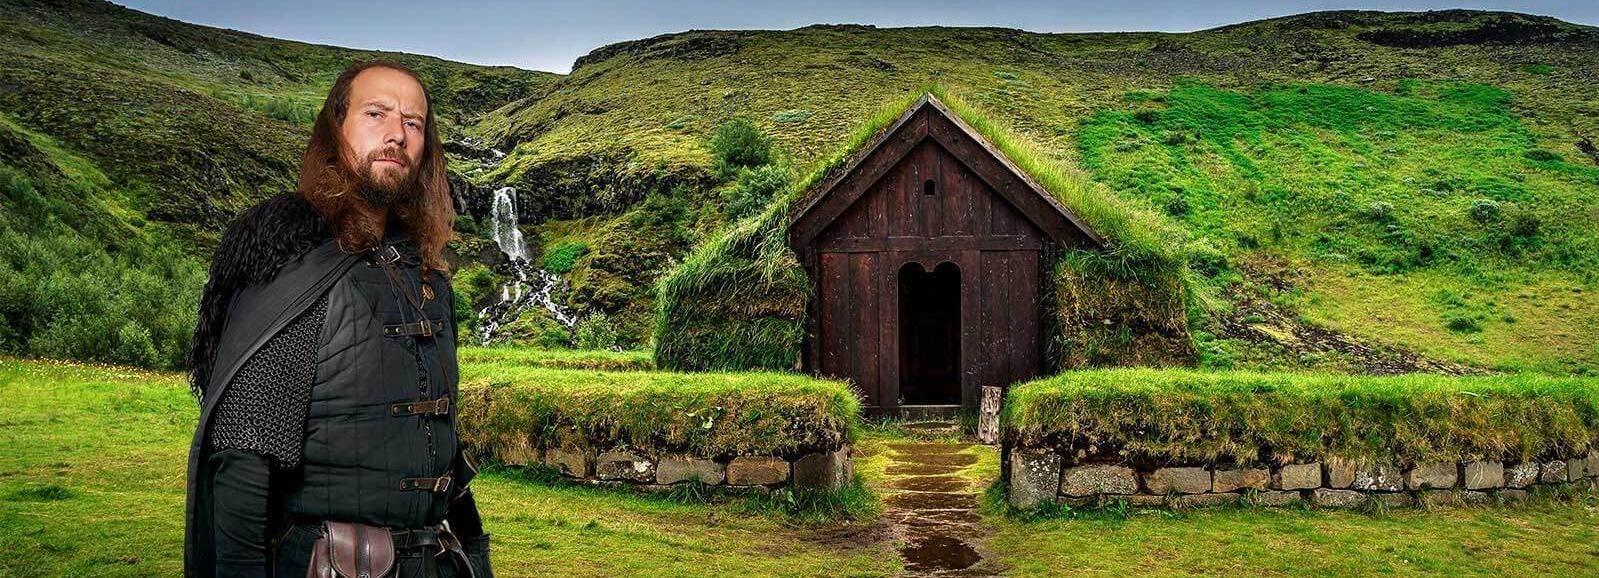 Island: heldagstur med Game of Thrones-tema